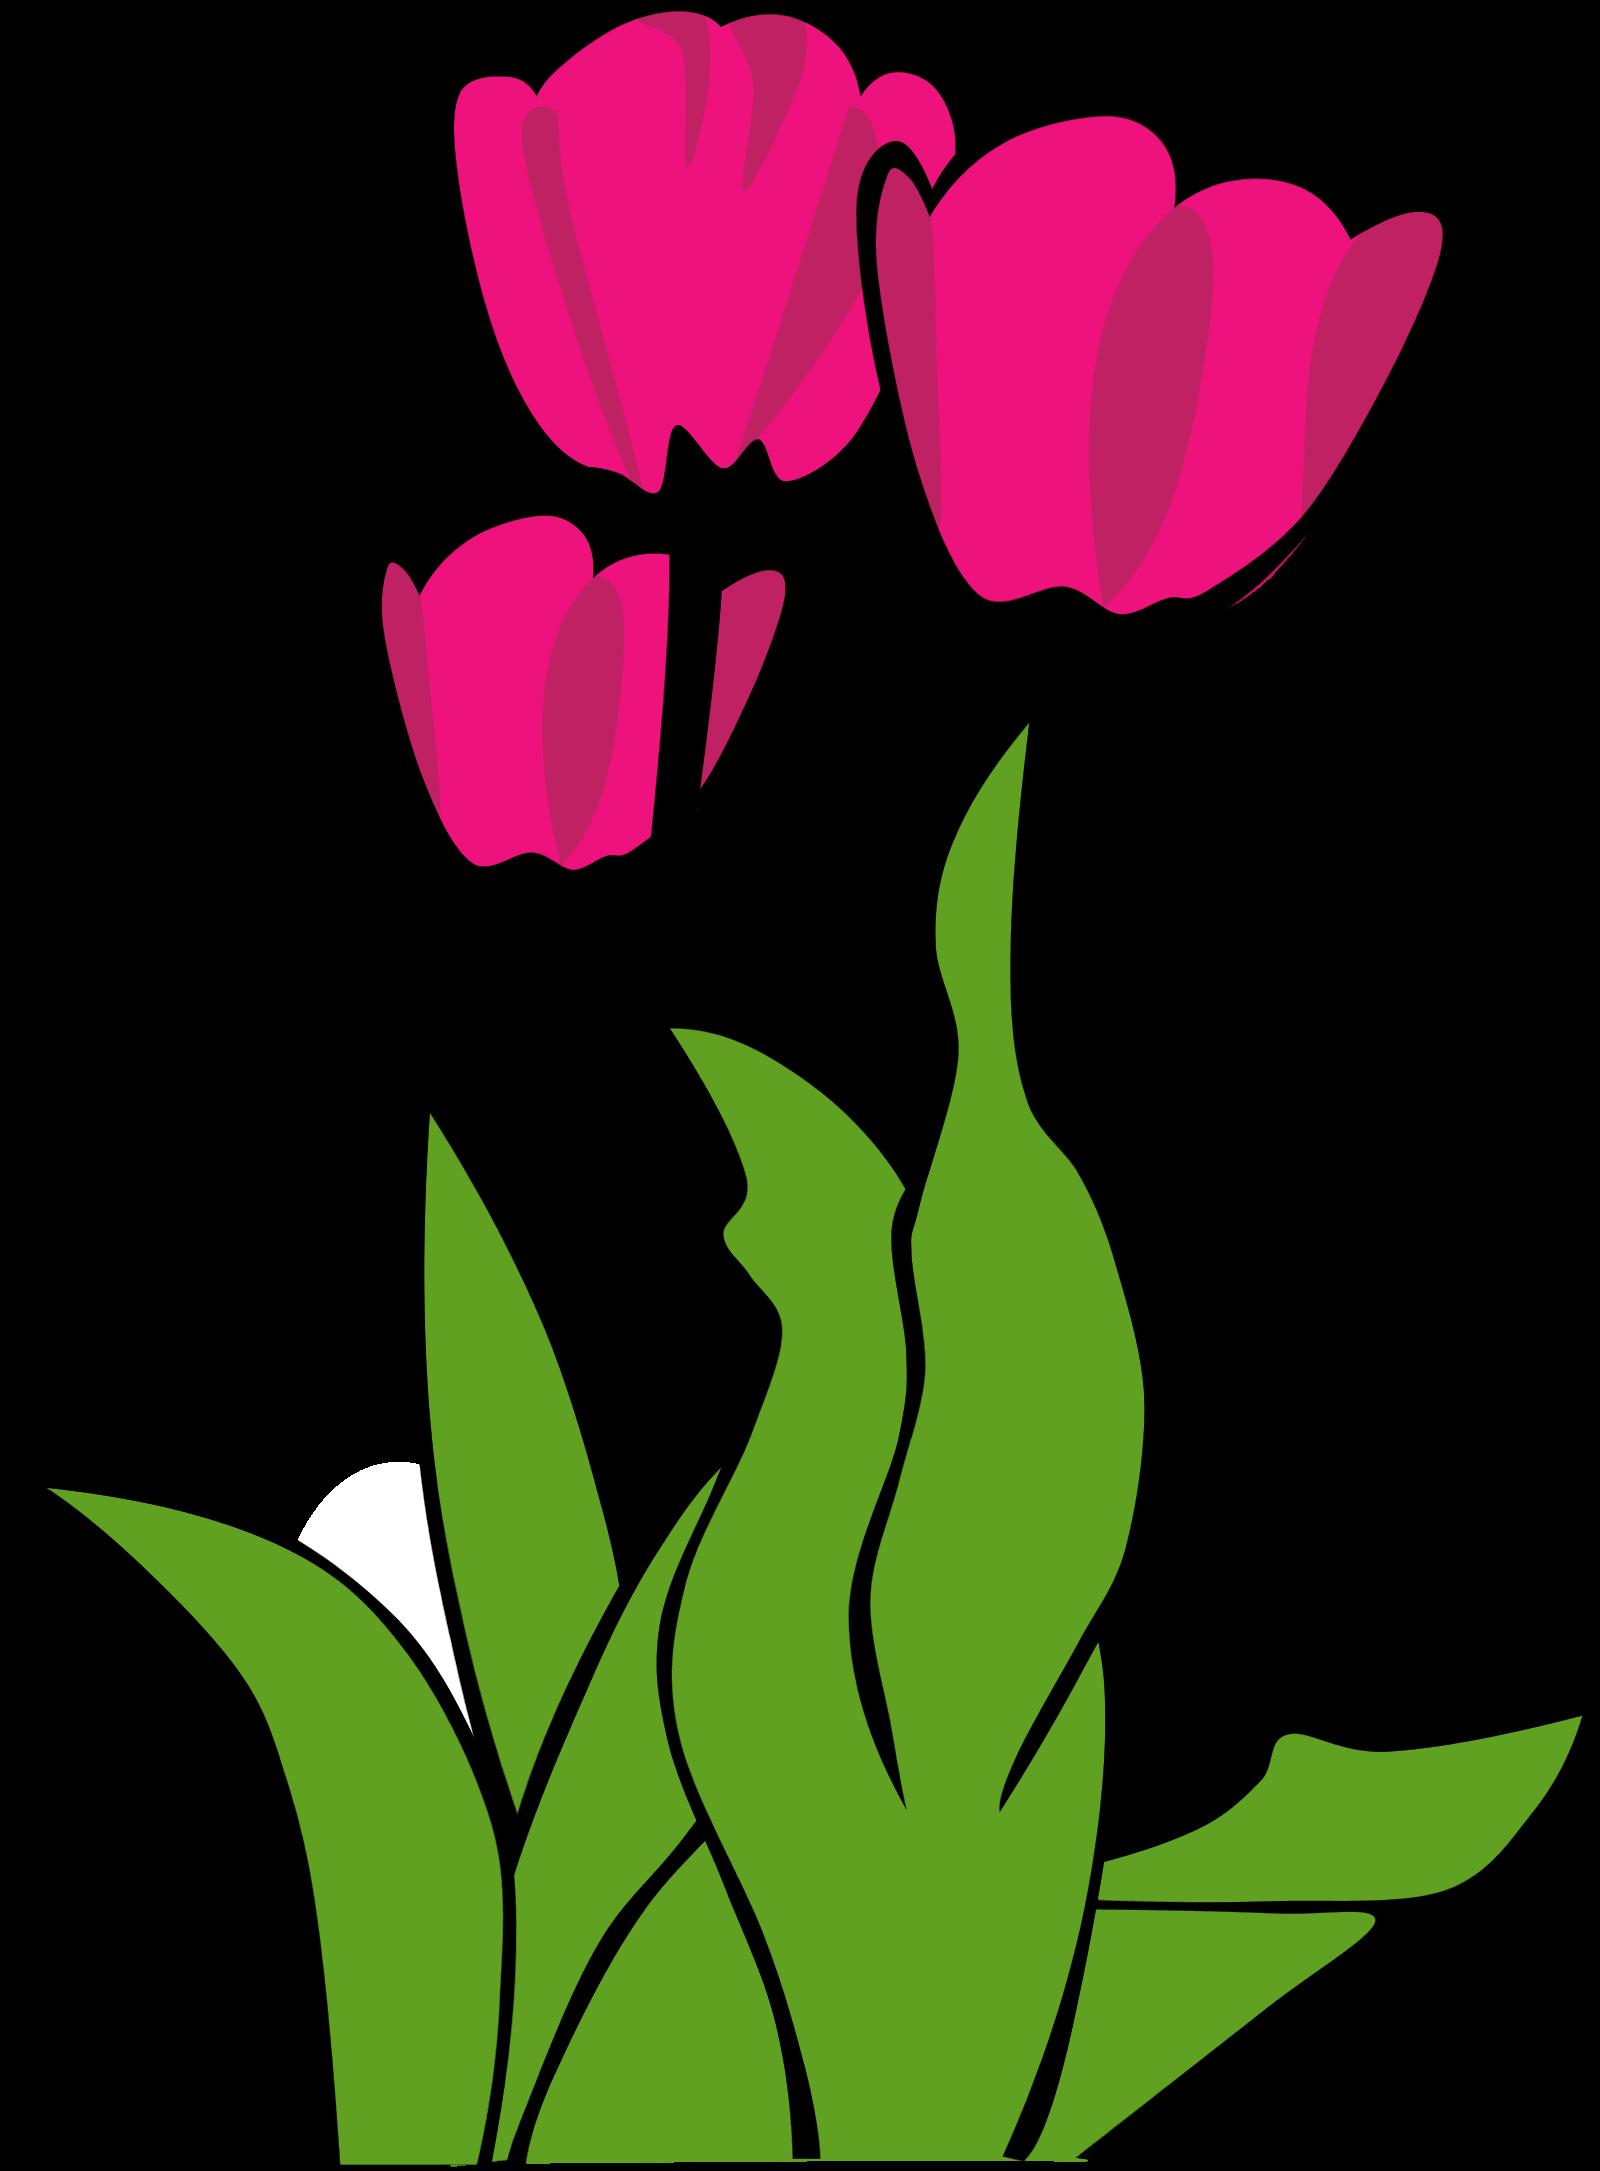 Panda free images clip. Flowers clipart tulip